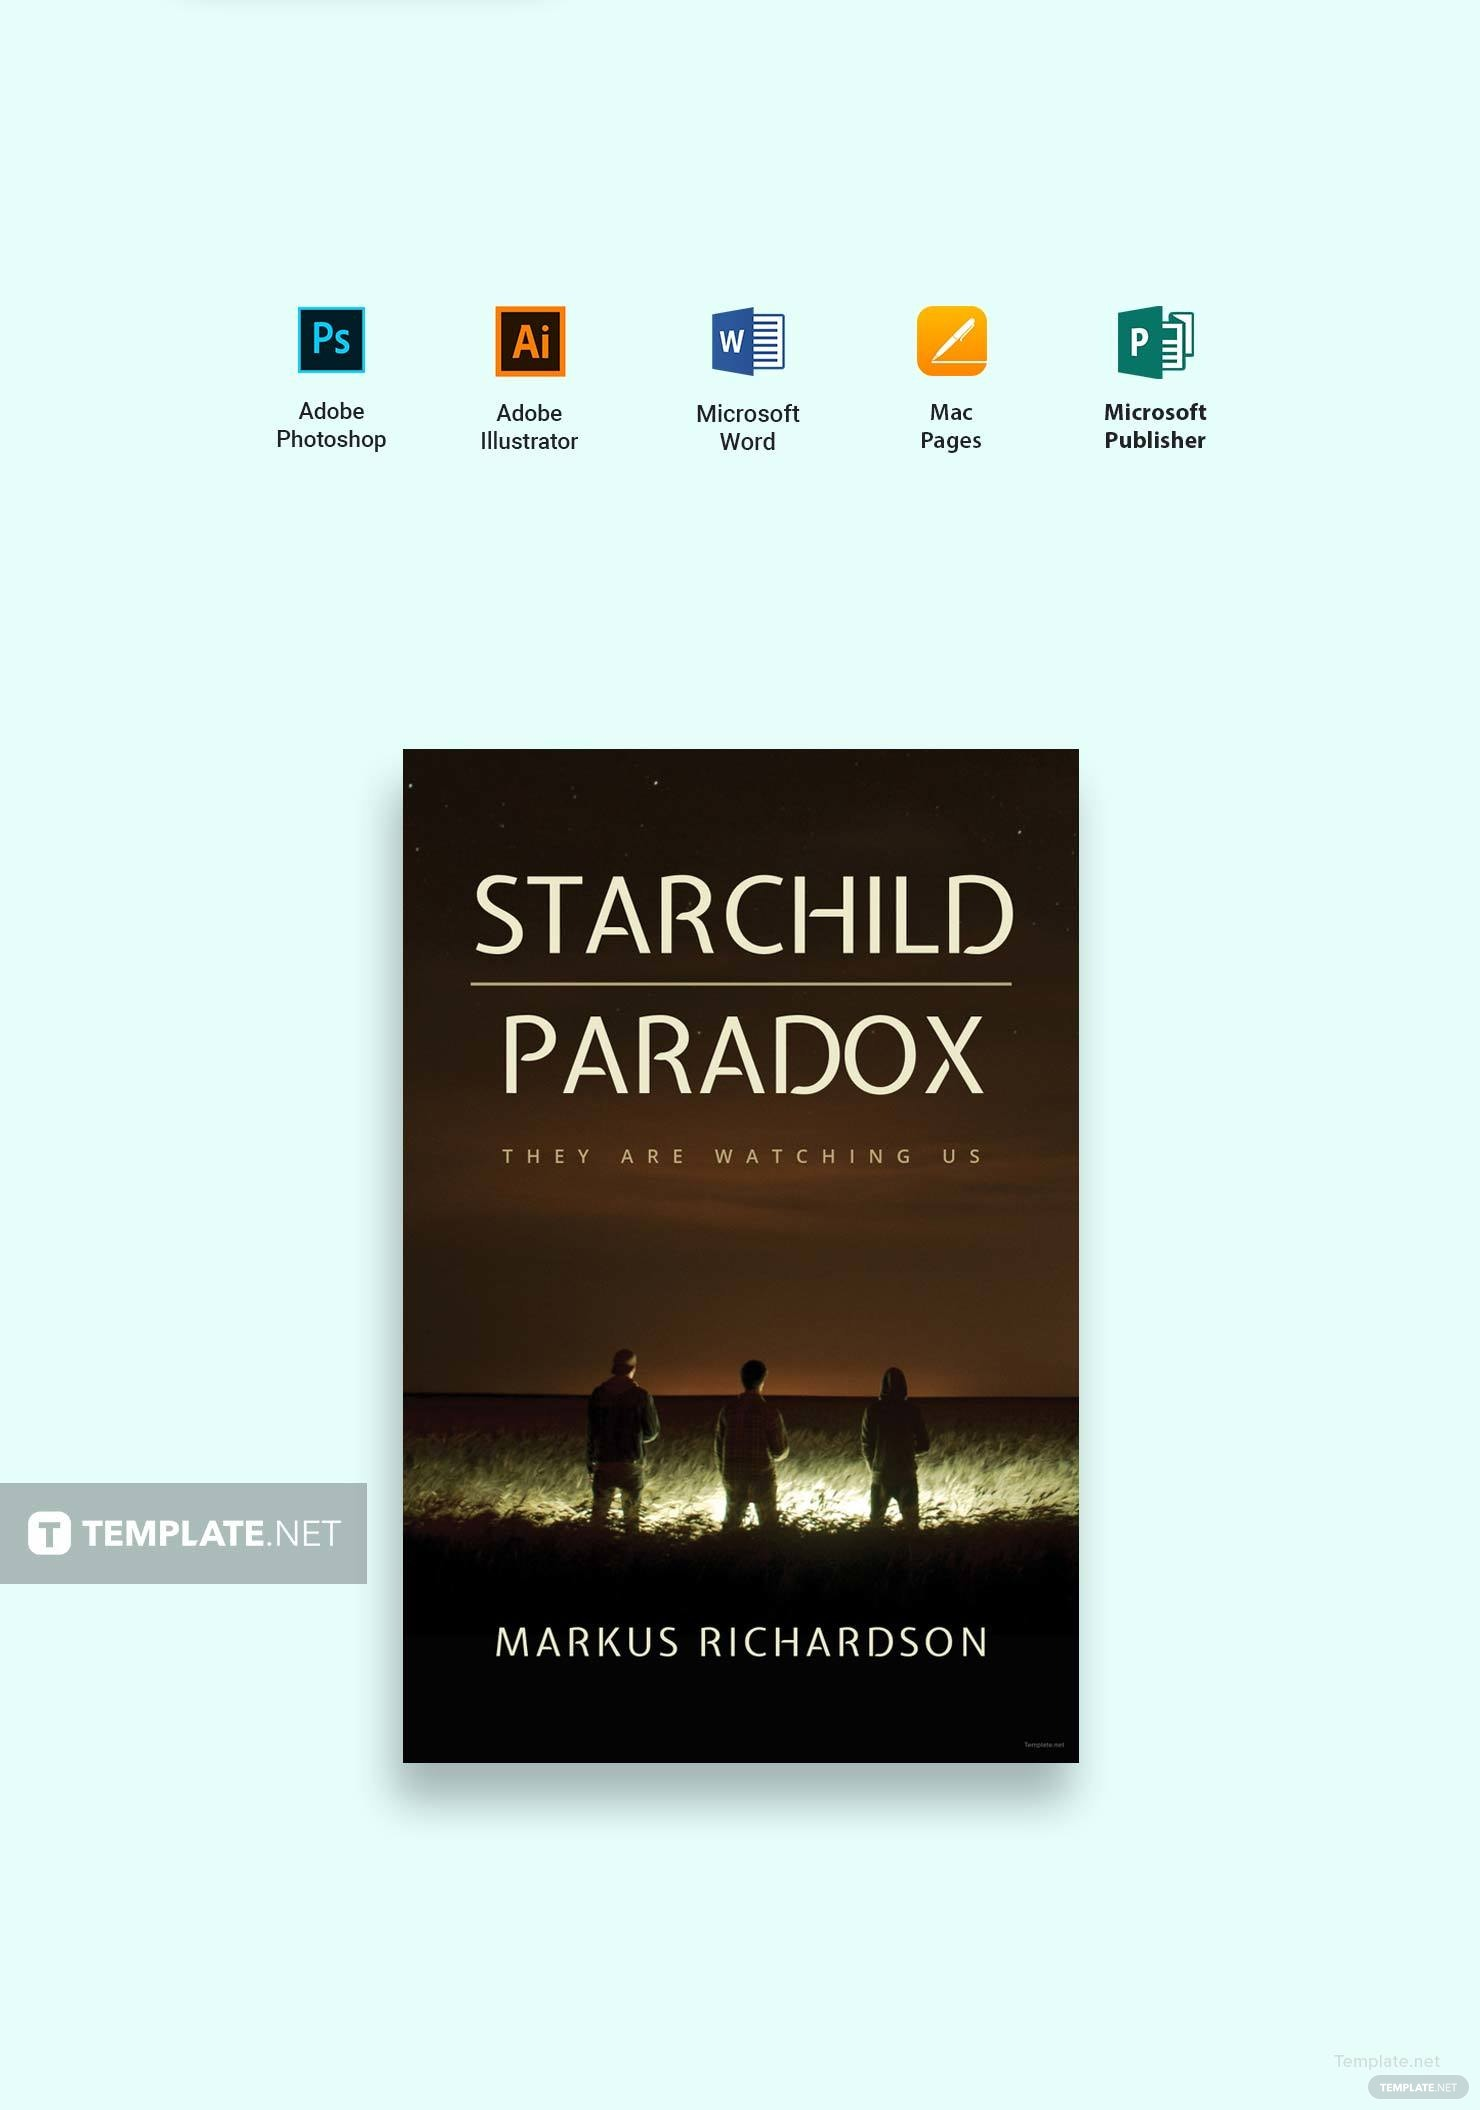 microsoft publisher book cover template